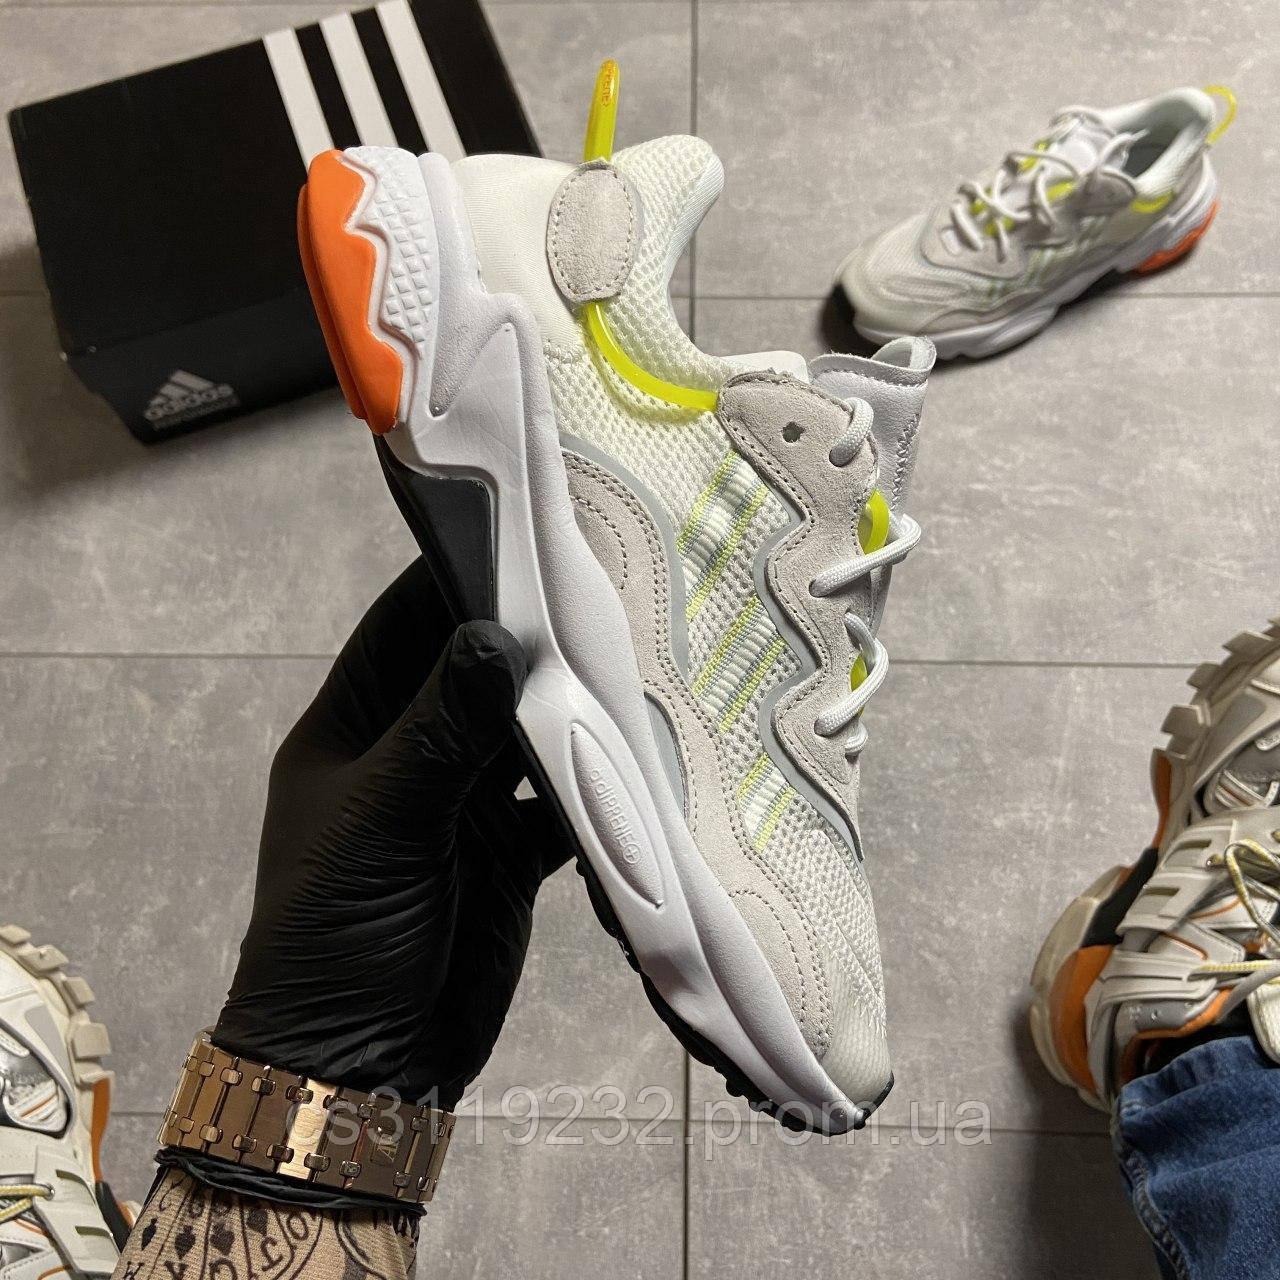 Мужские кроссовки Adidas Ozweego White Green (белый)